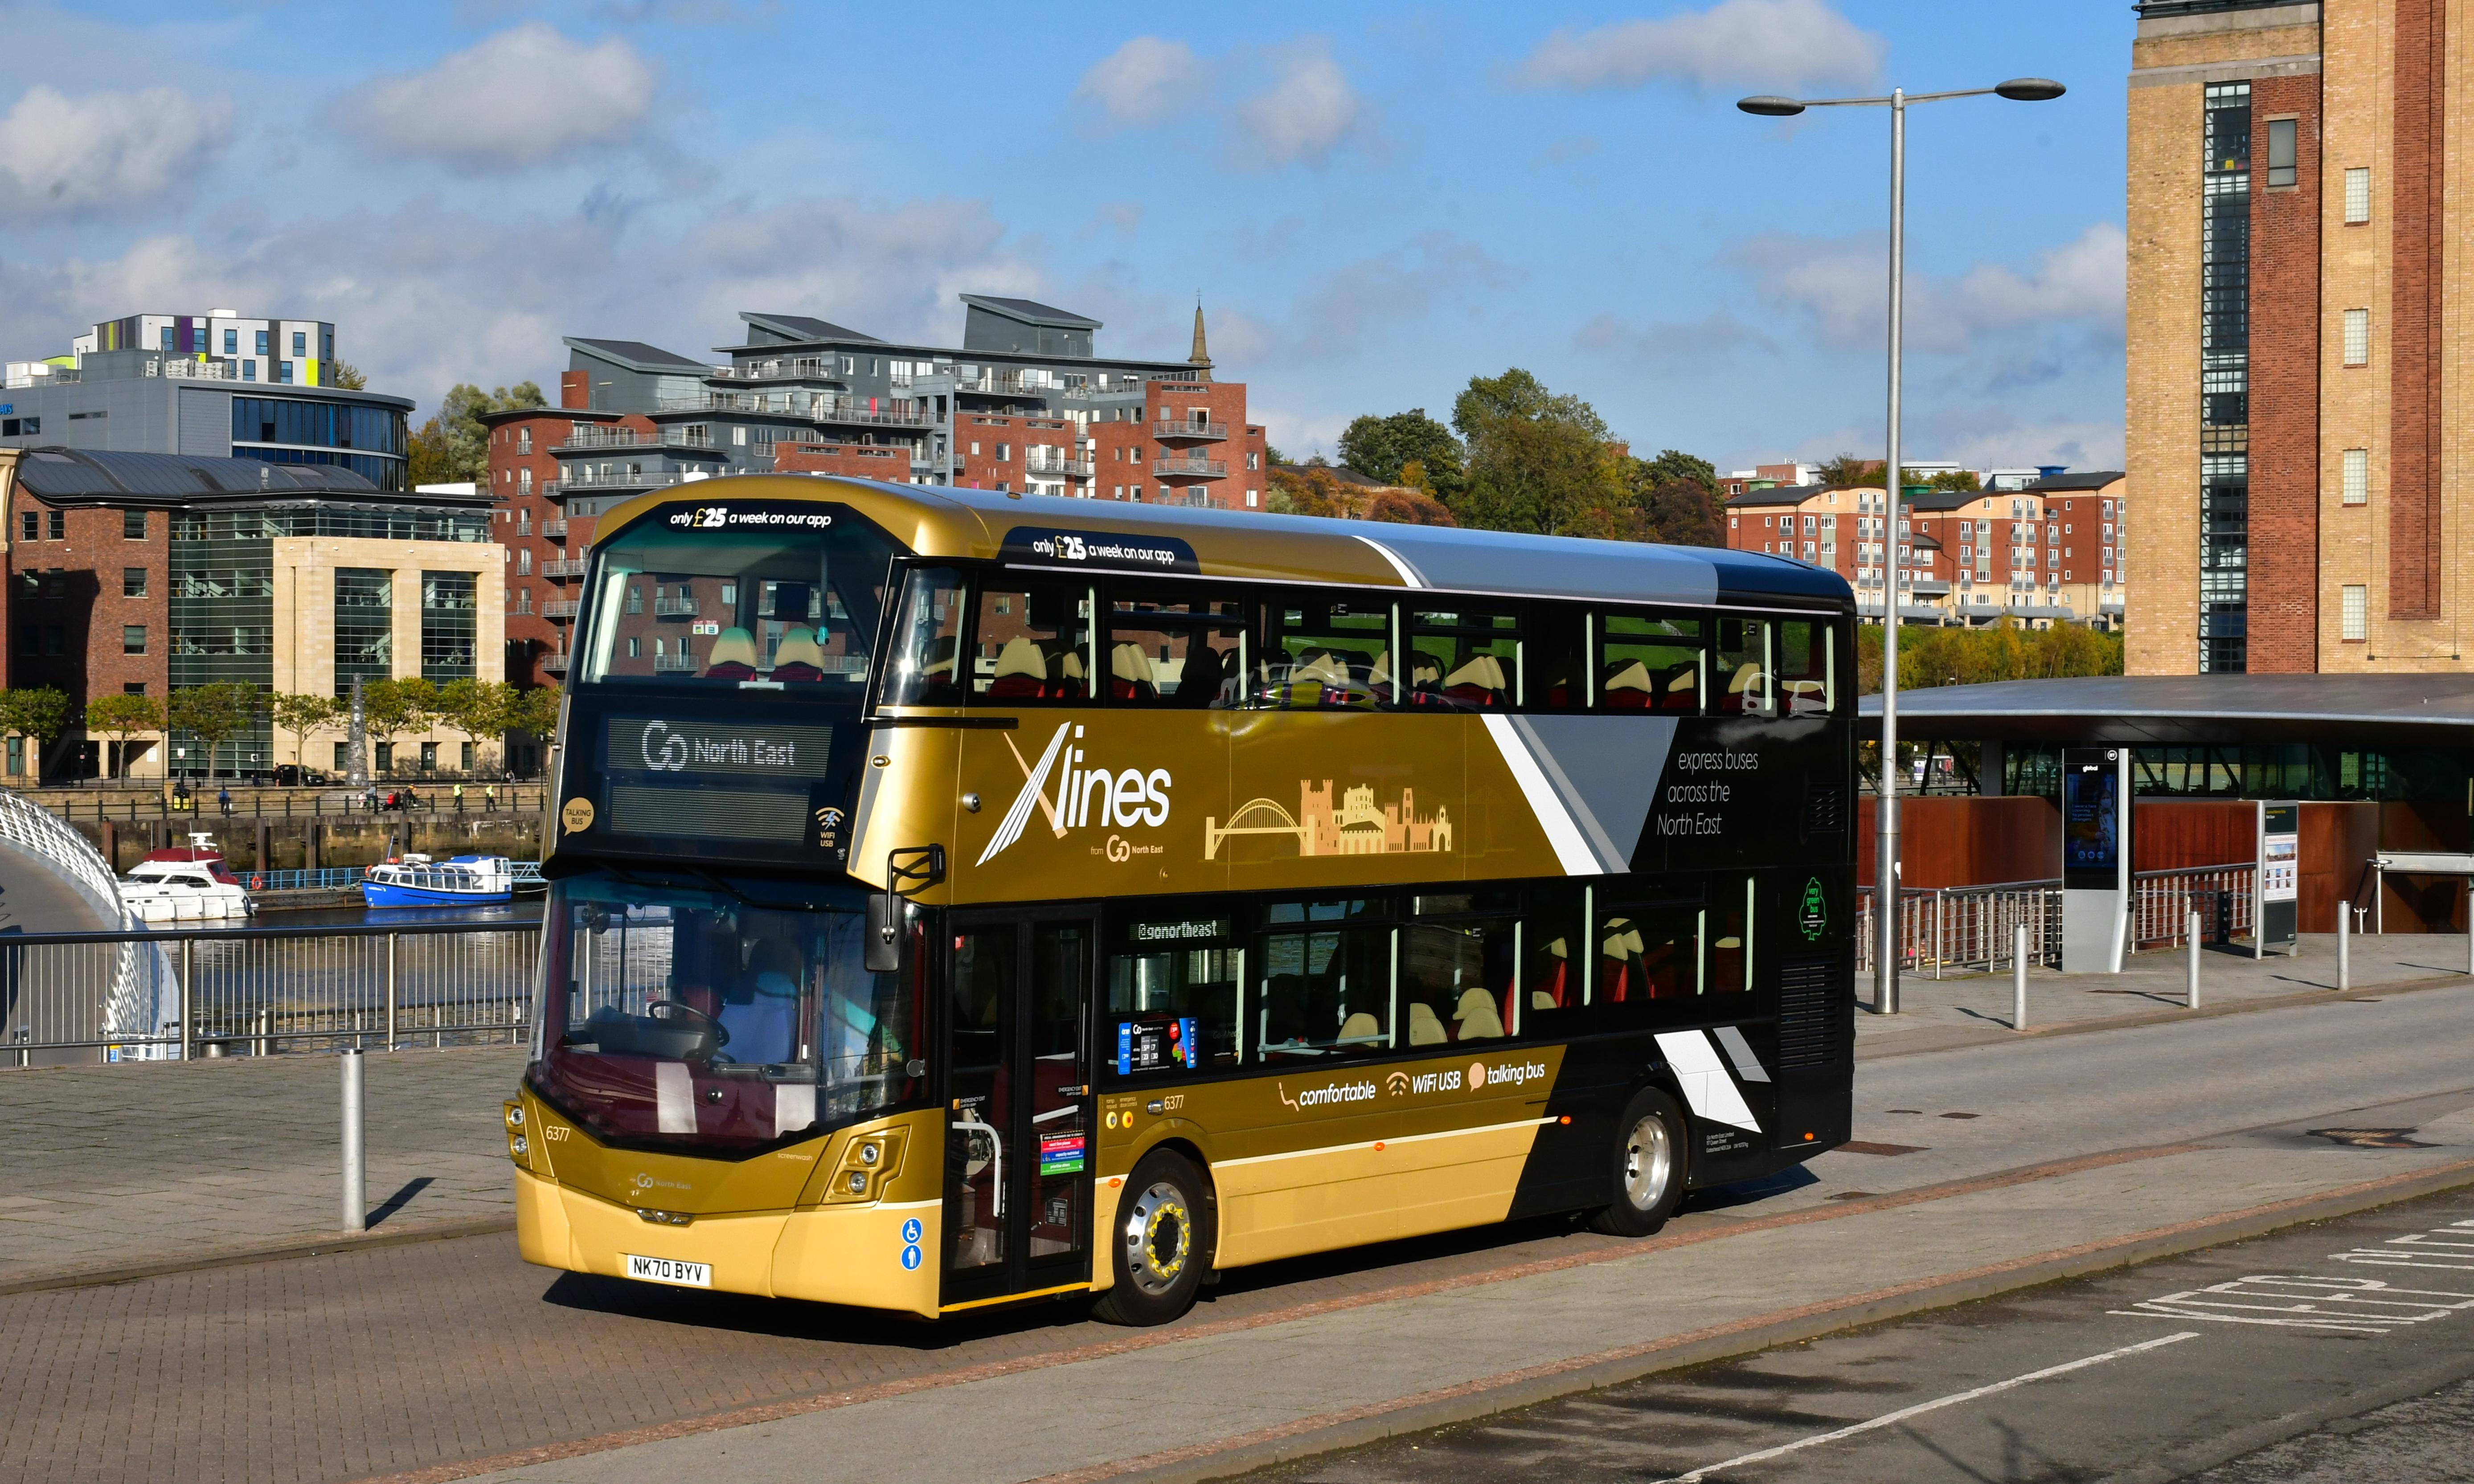 Wright Streetdeck 6-cylinder bus